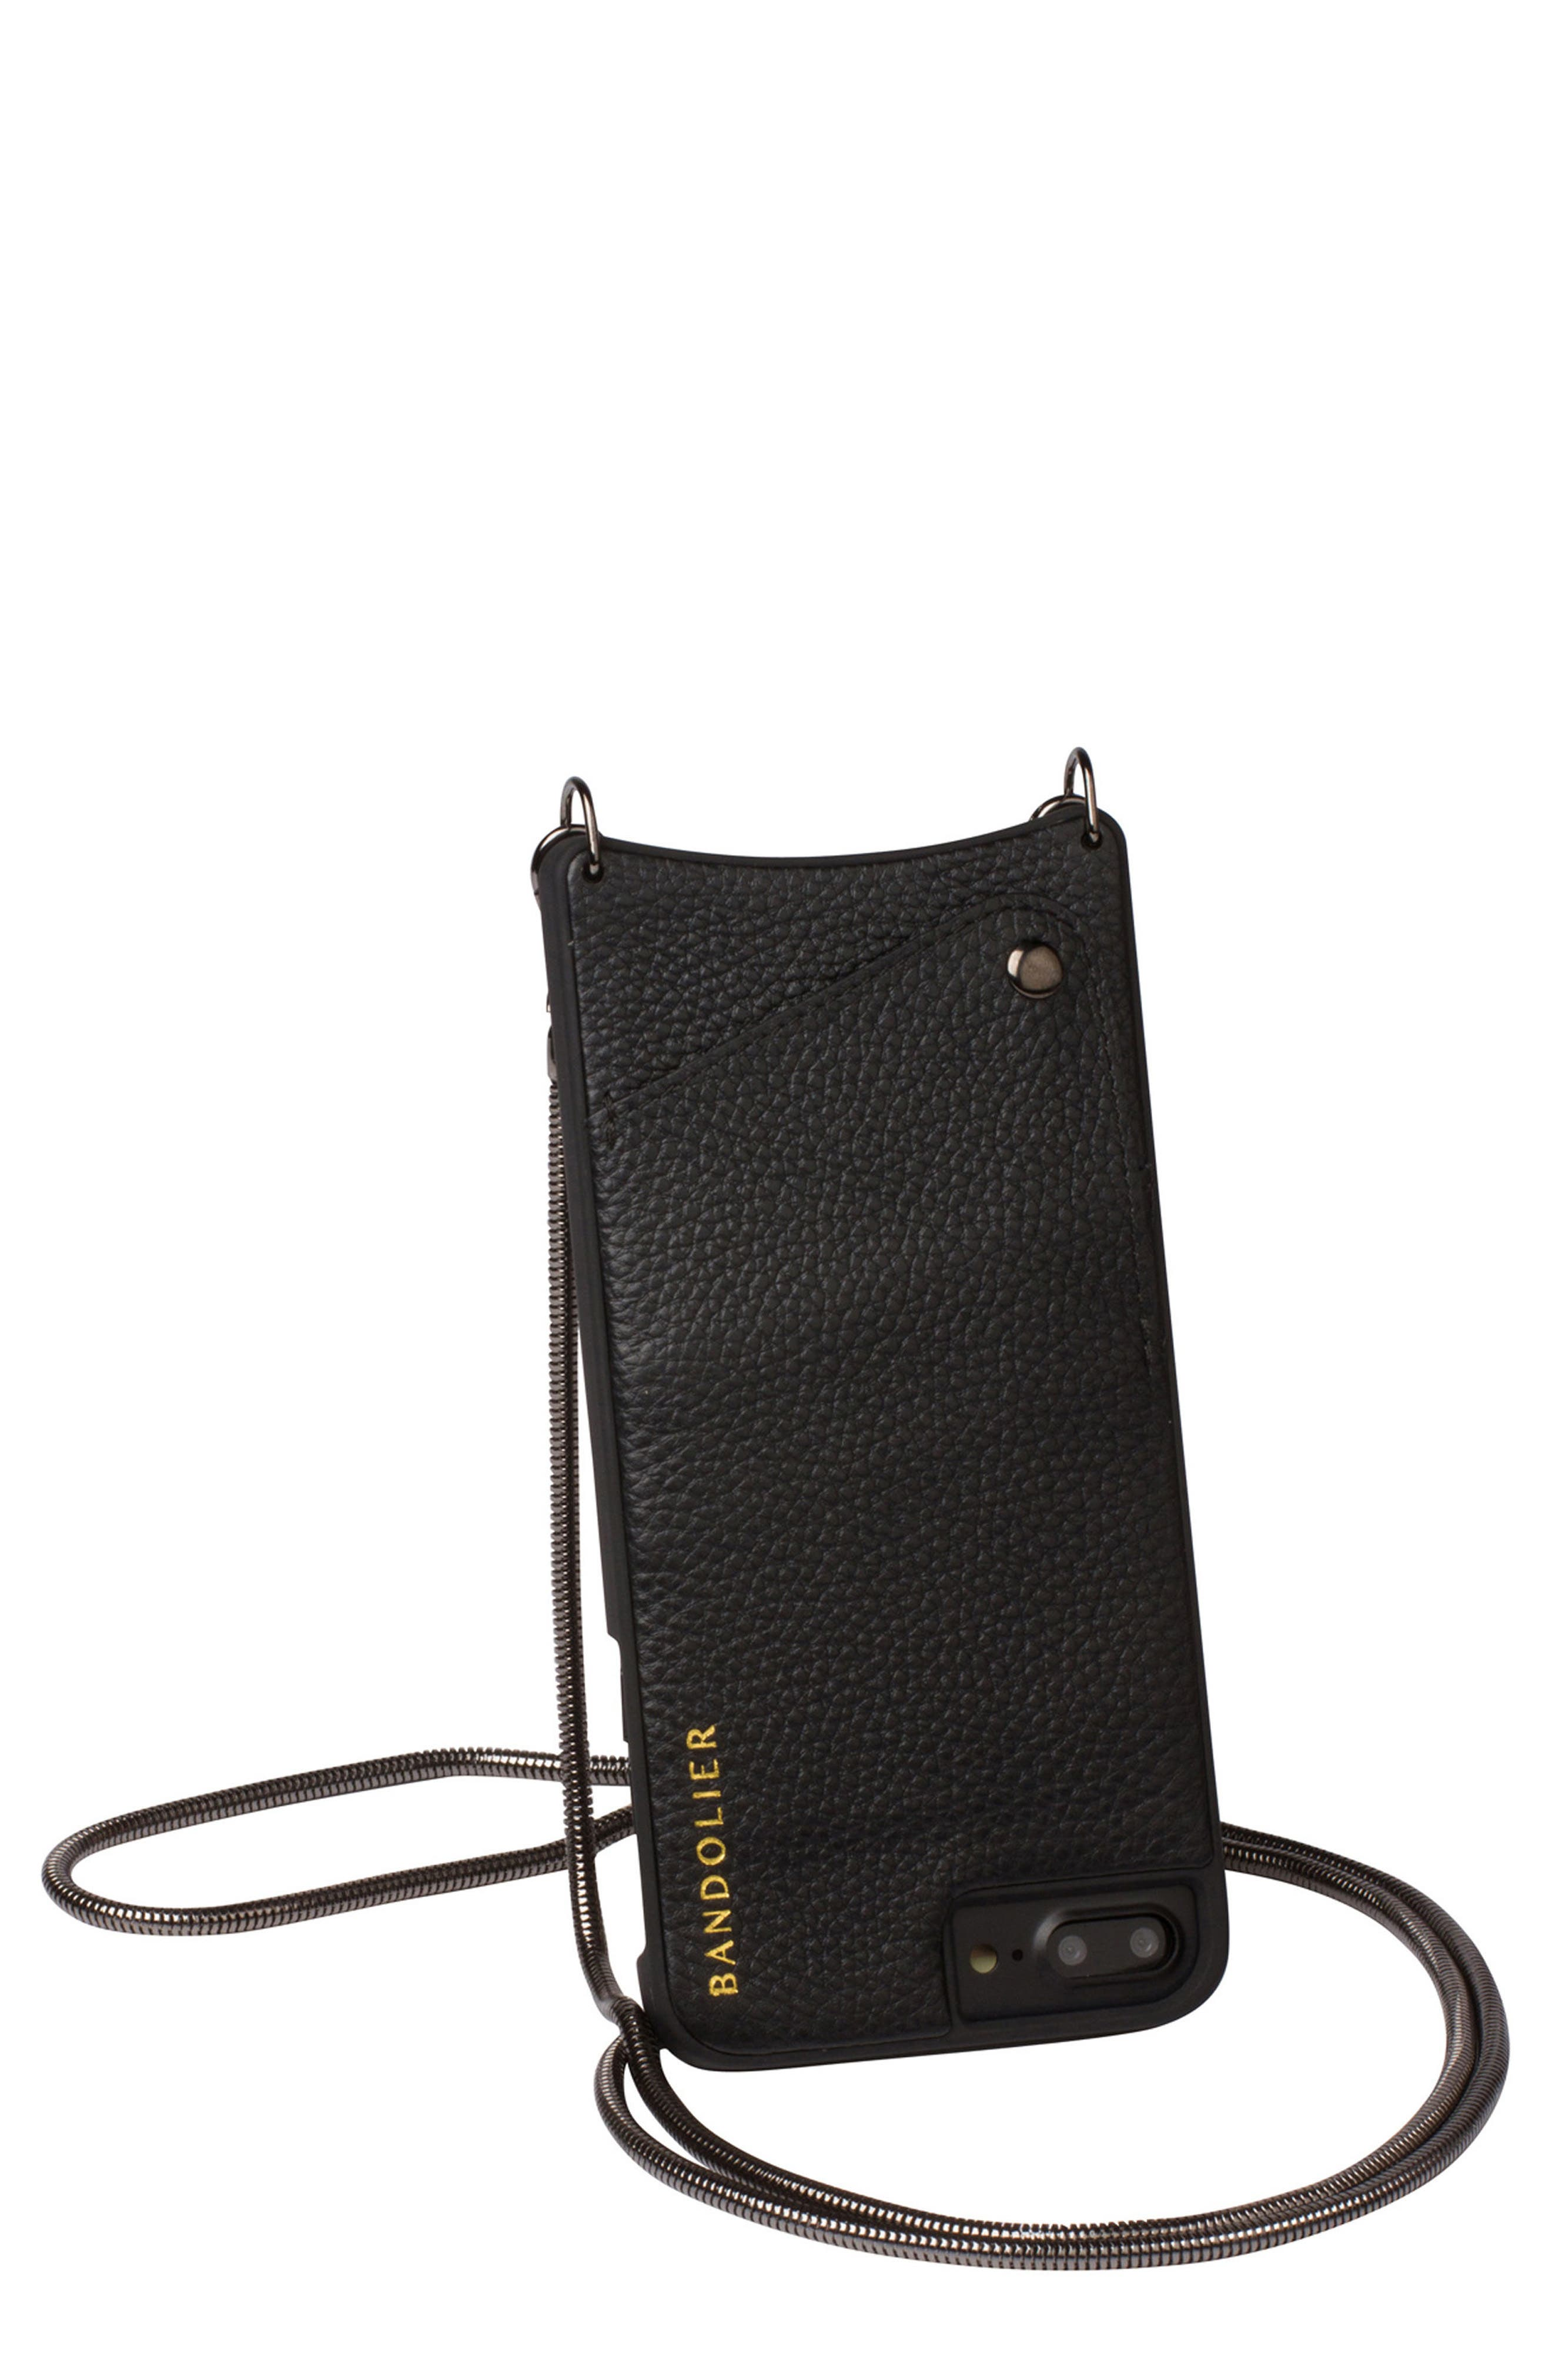 Bandolier Belinda iPhone 6/6s/7/8 & 6/6s/7/8 Plus Crossbody Case